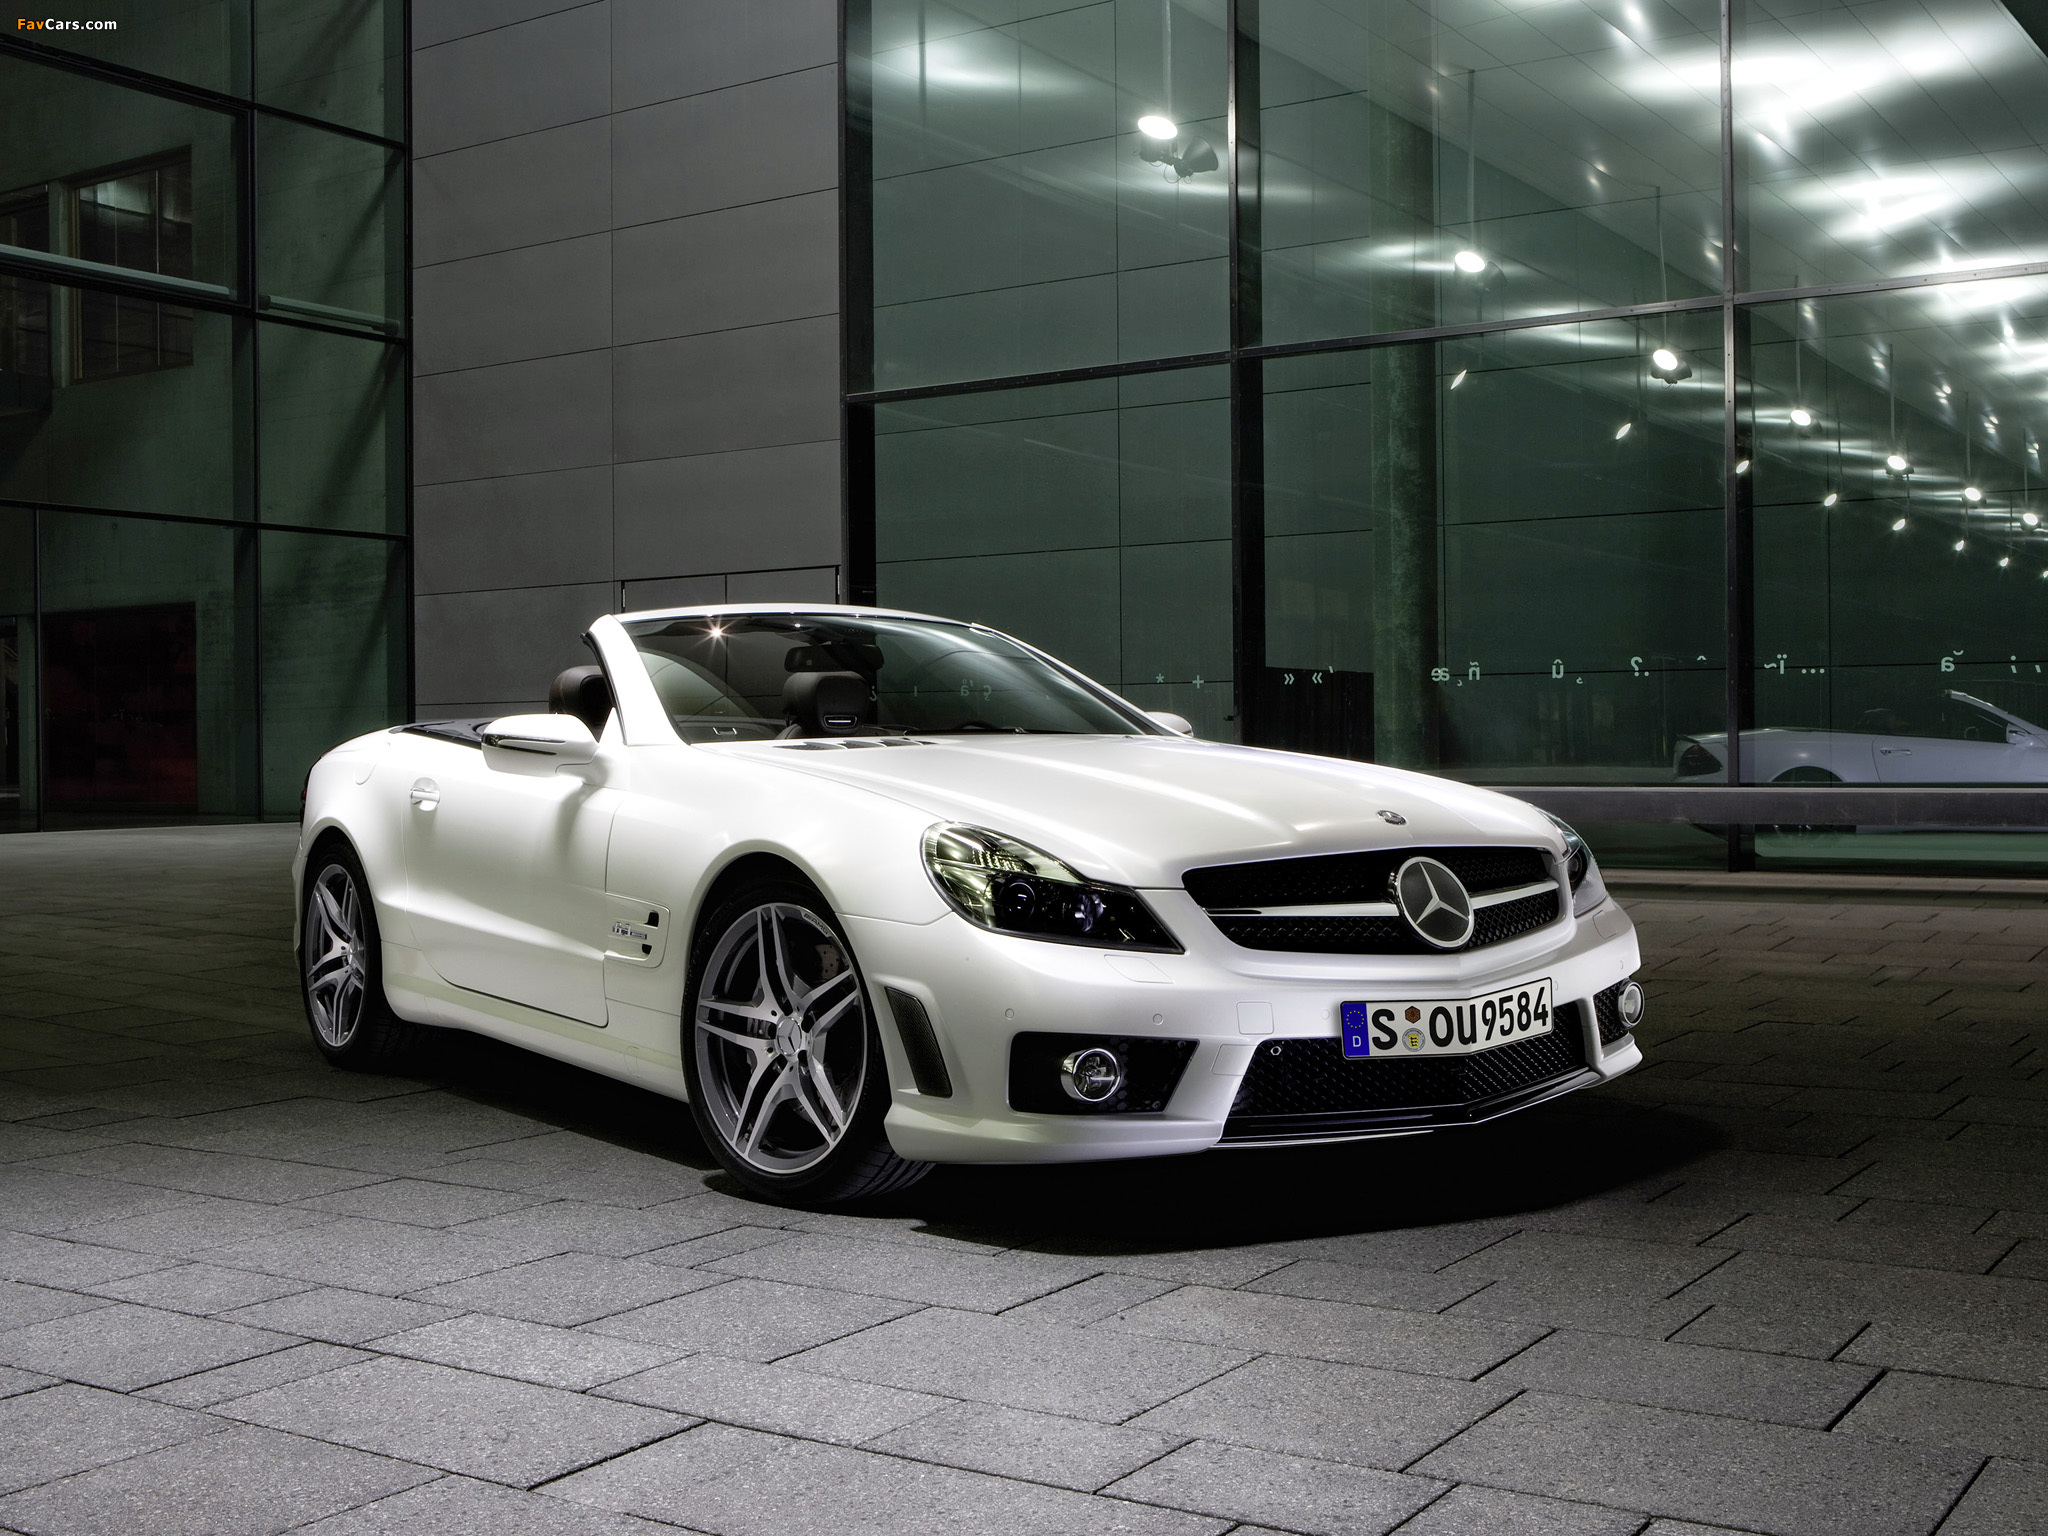 Mercedes-Benz SL 63 AMG Limited Edition IWC (R230) 2008 images (2048 x 1536)